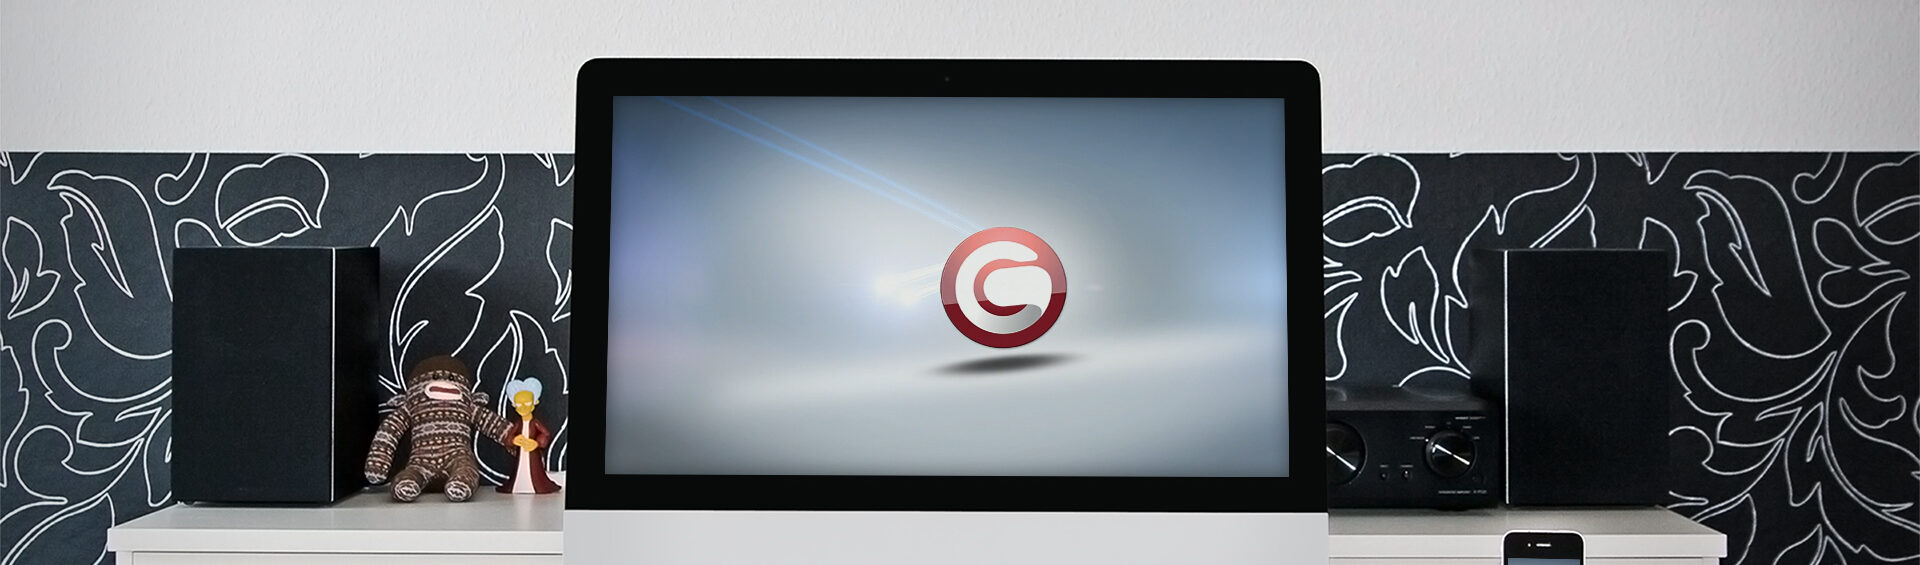 3d-logo-reveal